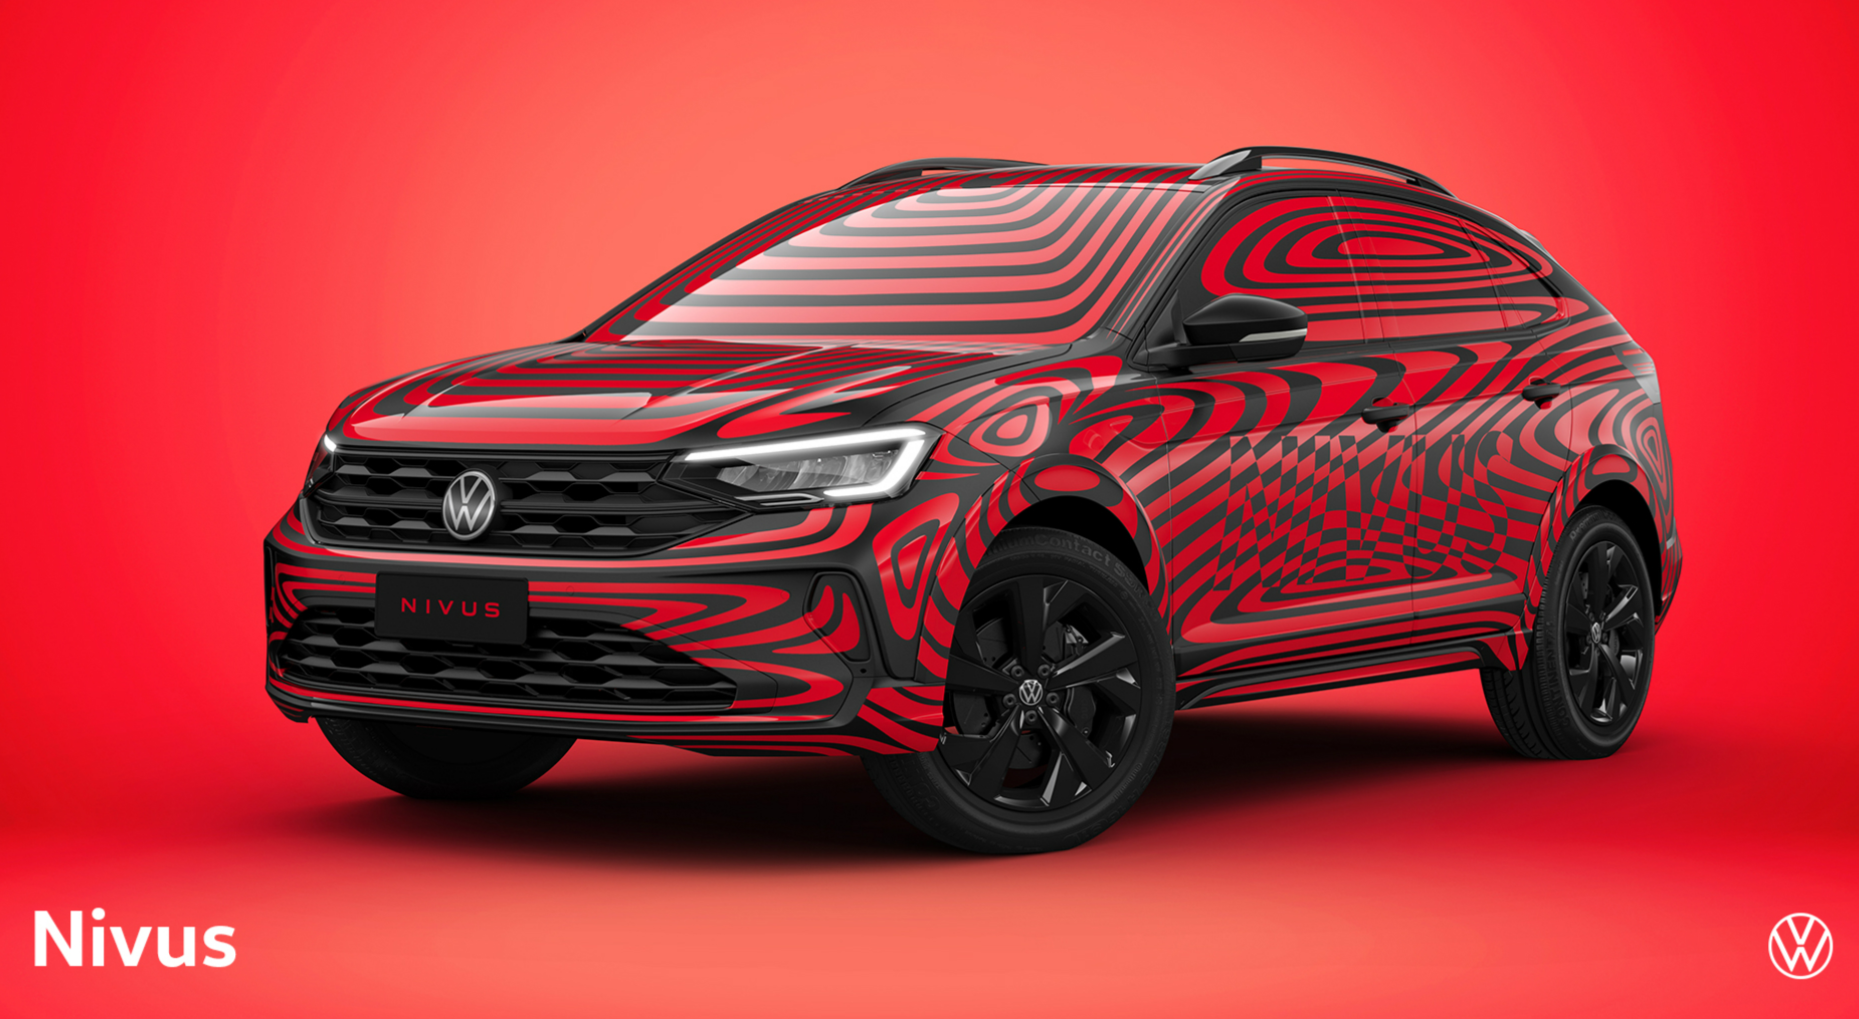 Volkswagen lança seu novo modelo CUV, o Nivus